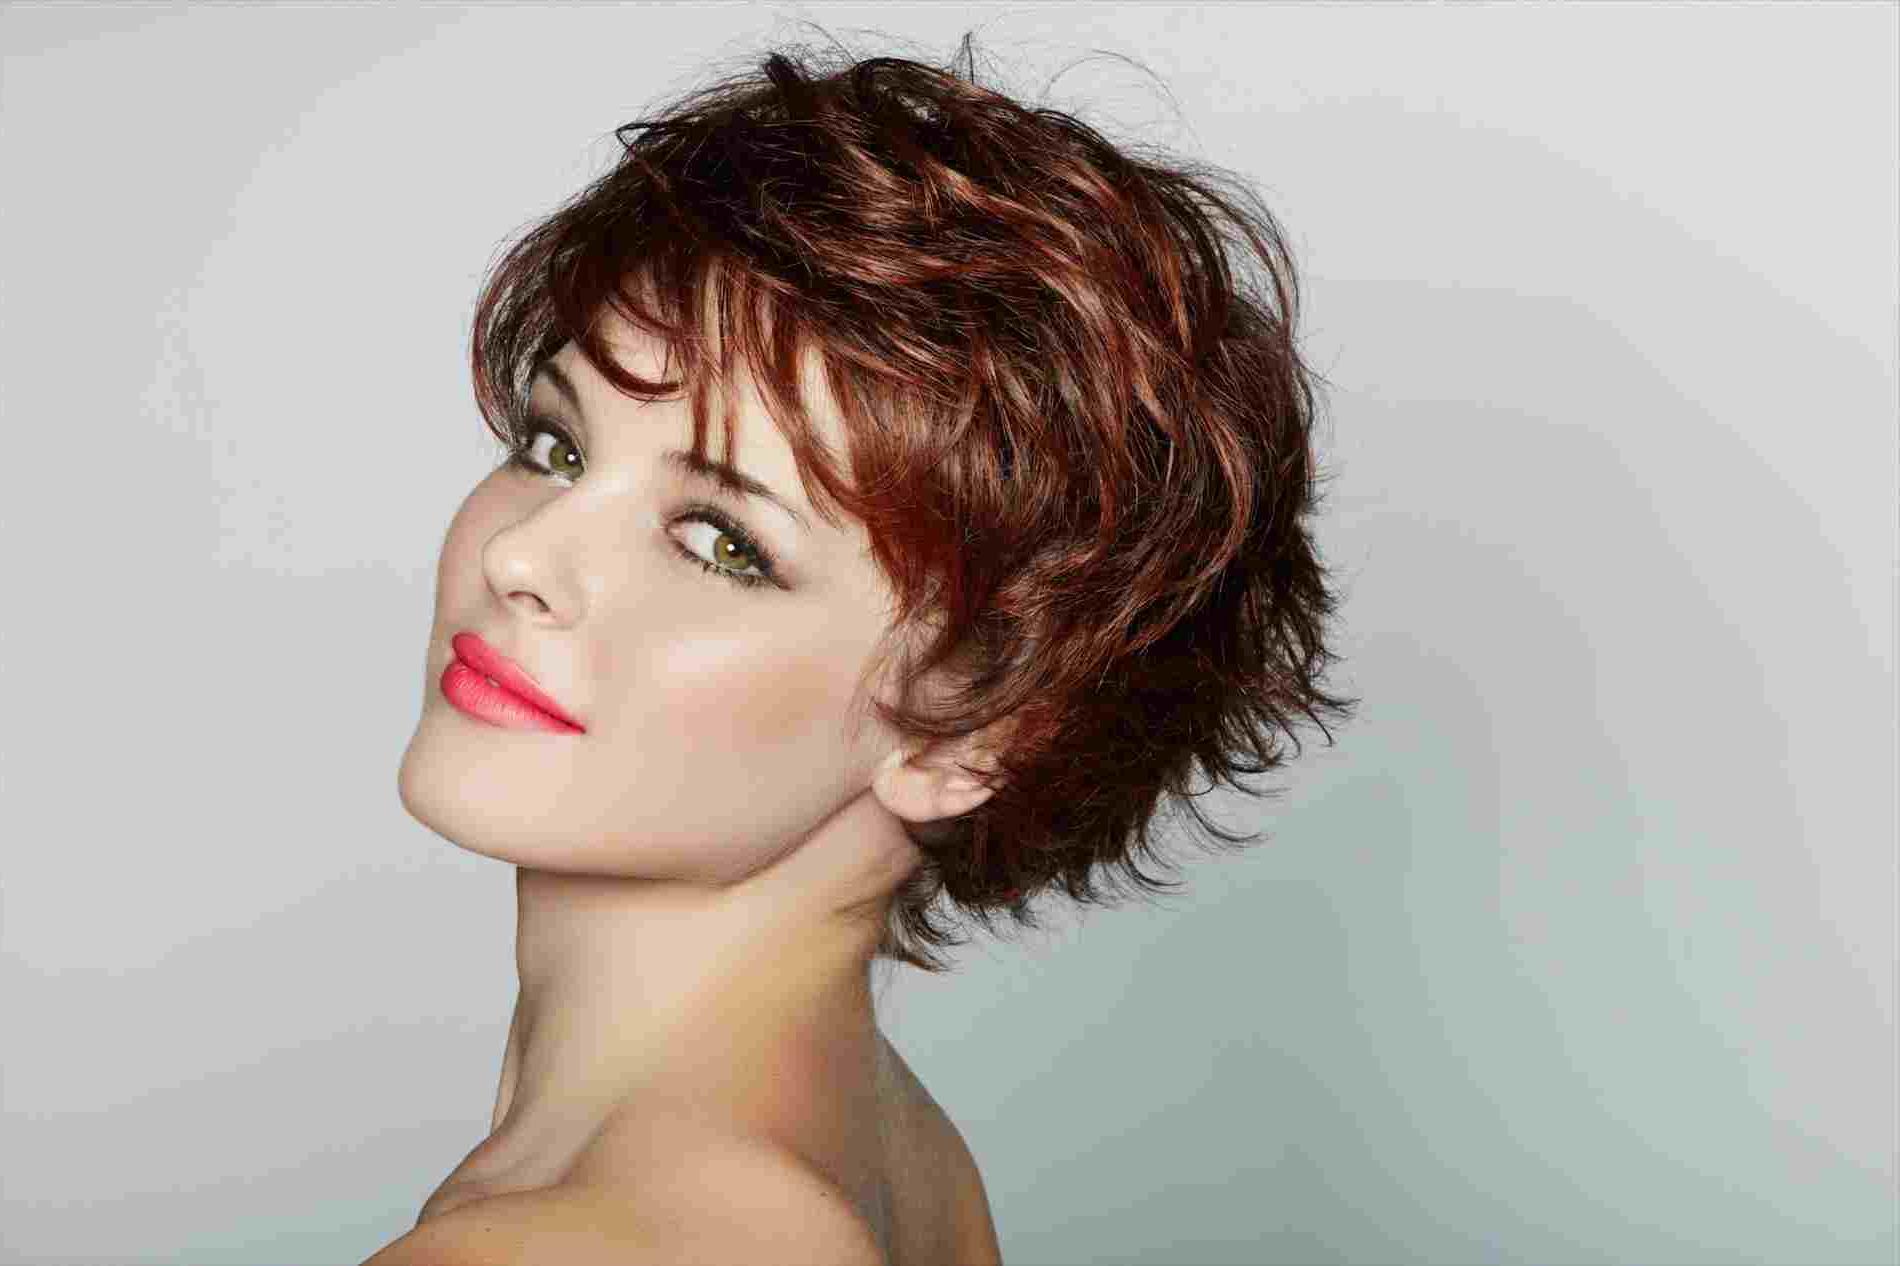 Short Haircuts For Thin Wavy Hair | Pokereborn Inside Short Haircuts For Thin Wavy Hair (View 24 of 25)